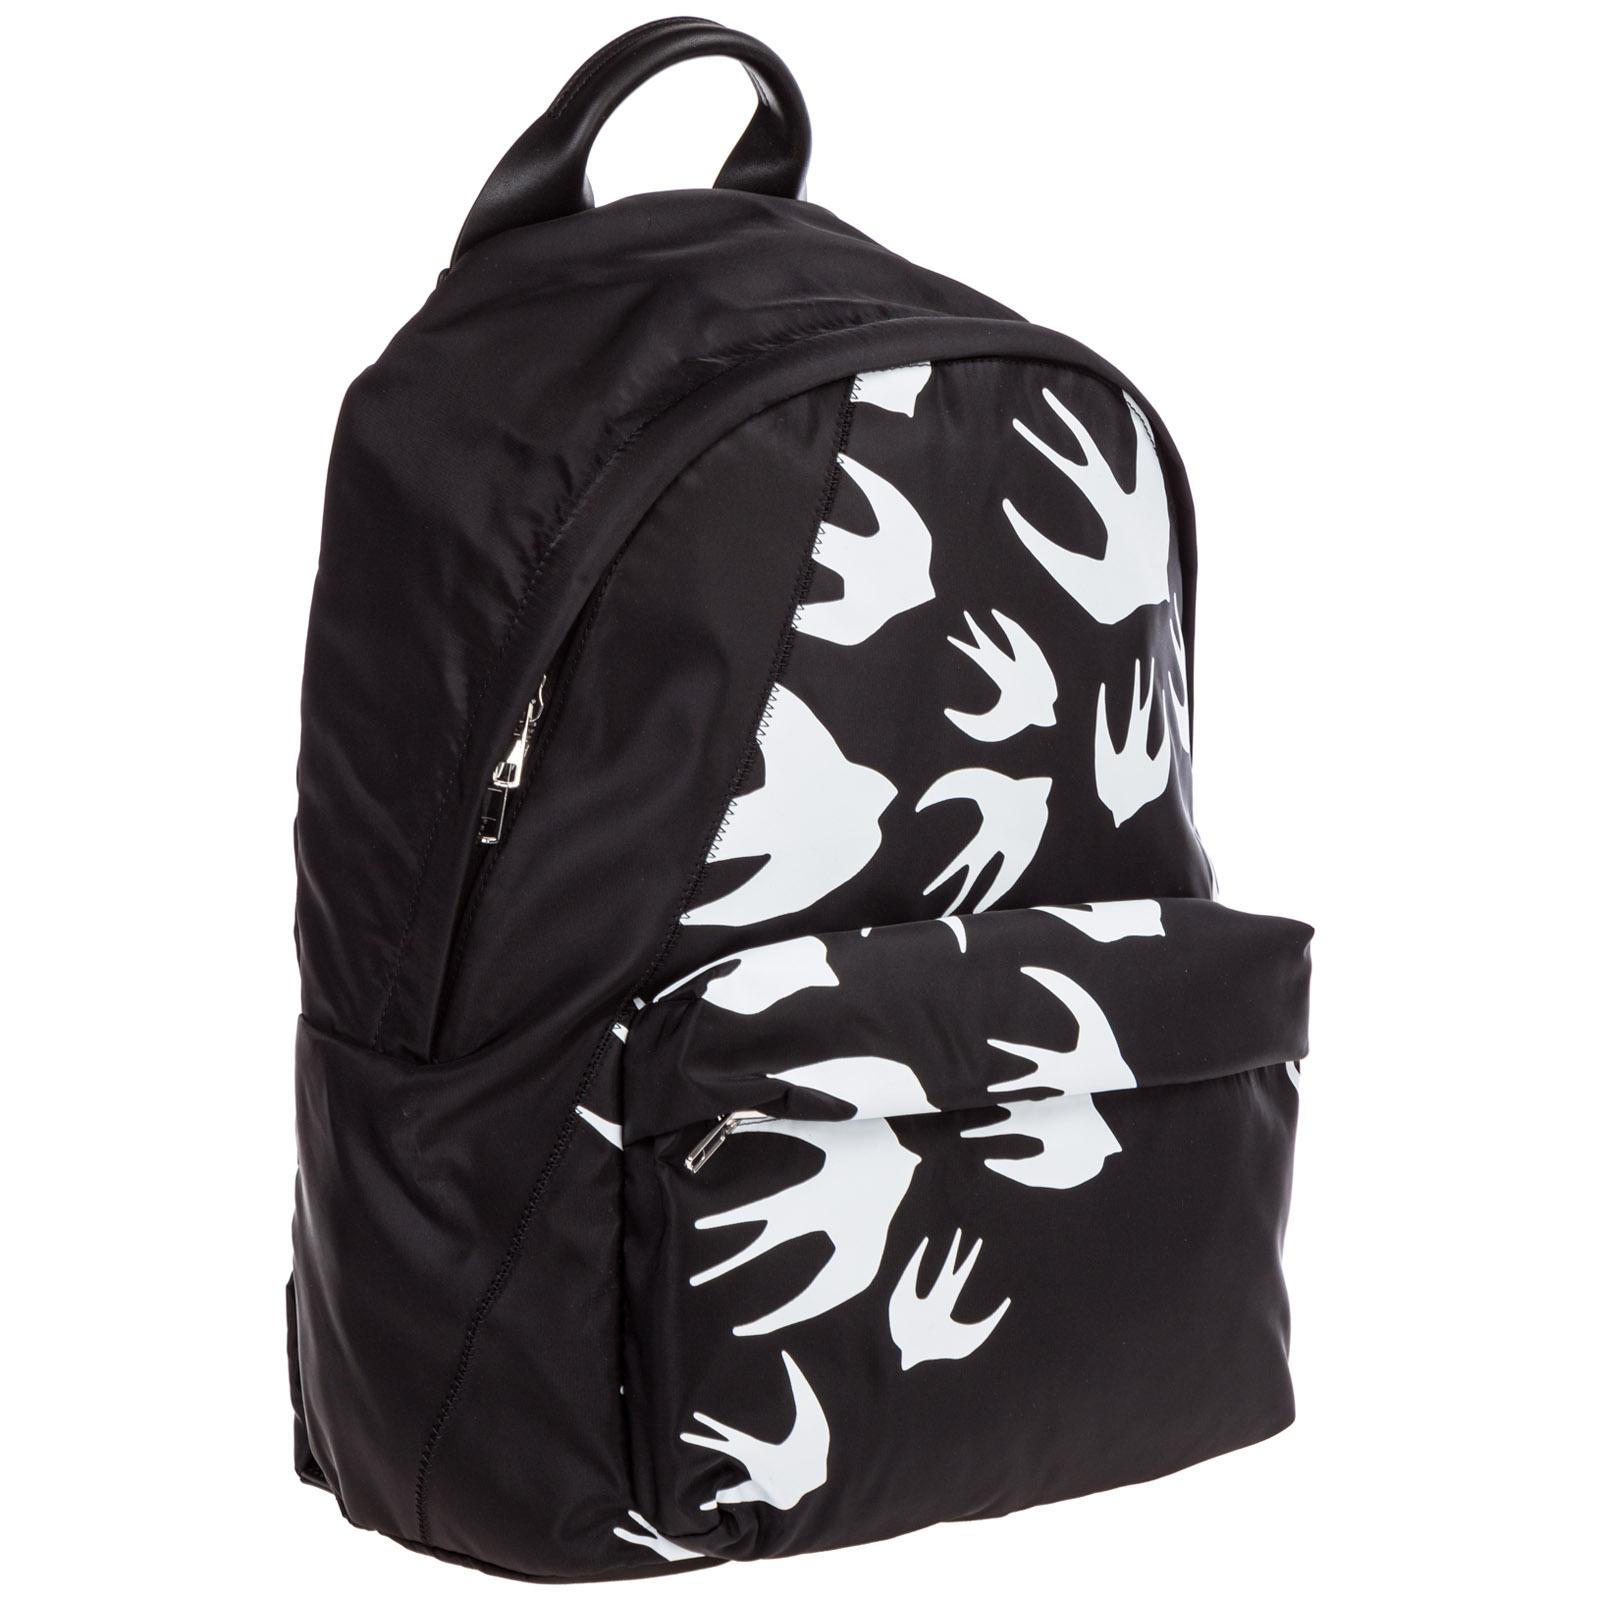 Rucksack backpack travel  swallow